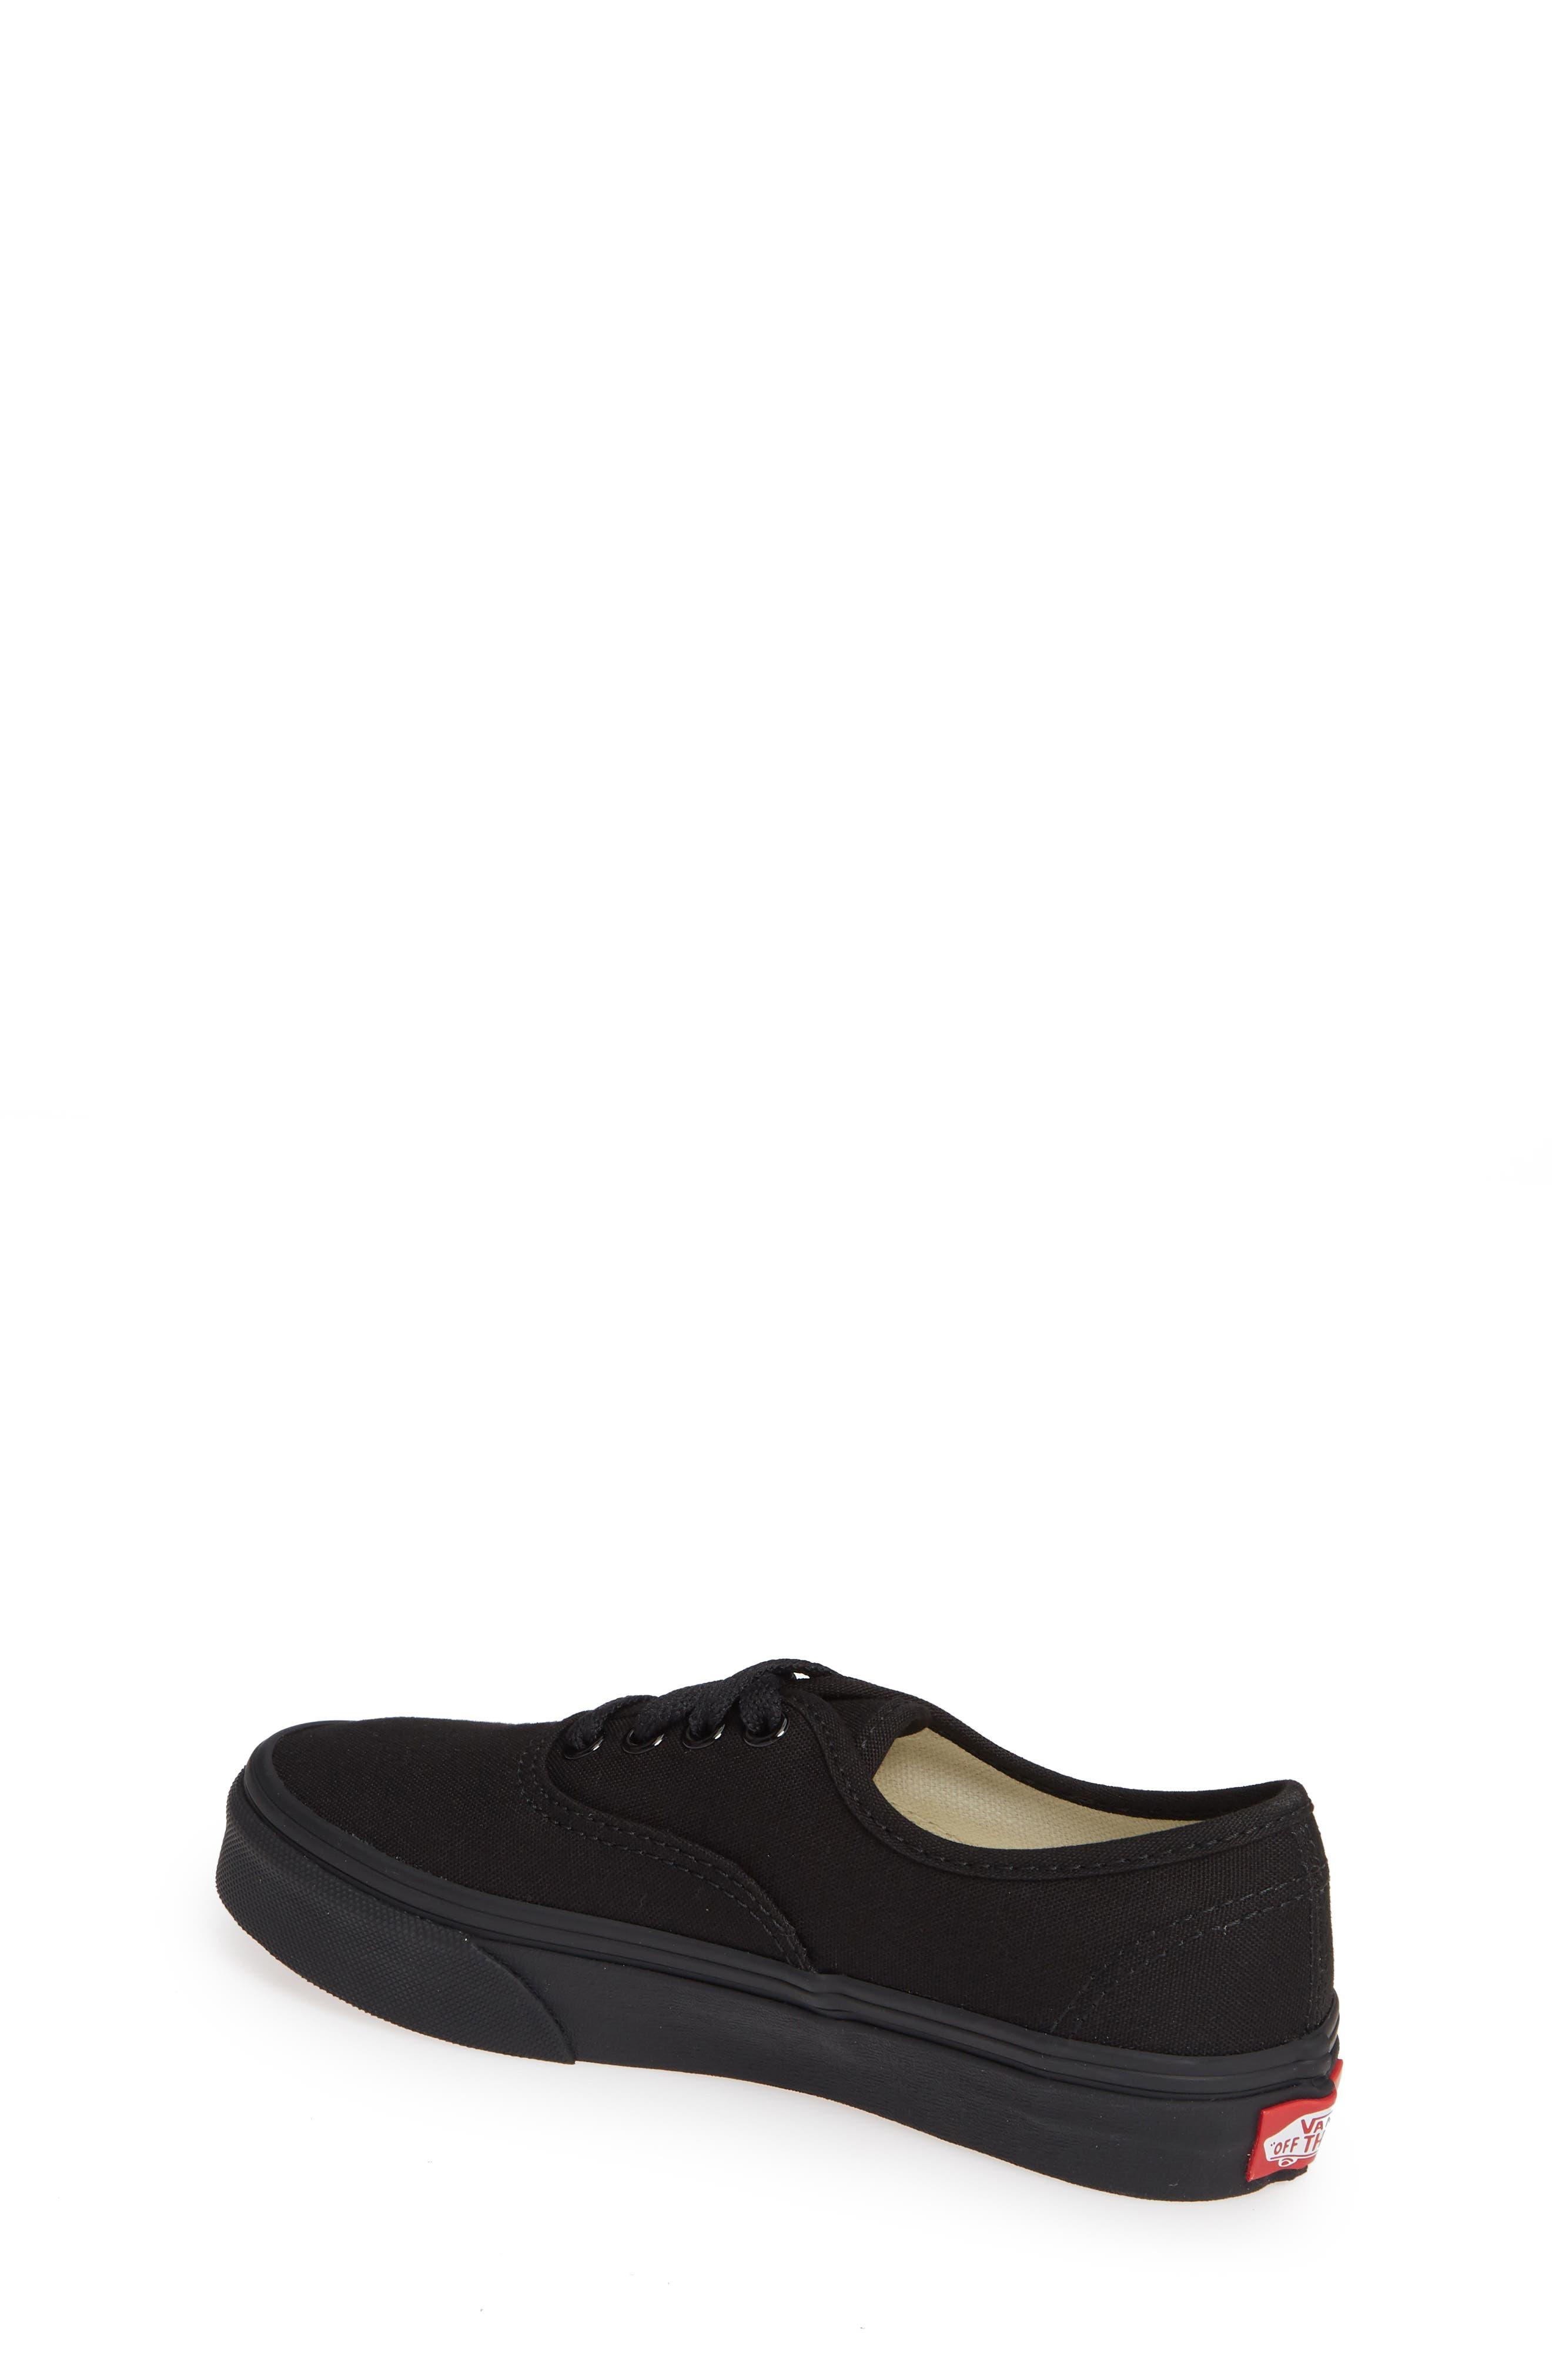 'Authentic' Sneaker,                             Alternate thumbnail 2, color,                             BLACK/ BLACK/ BLACK